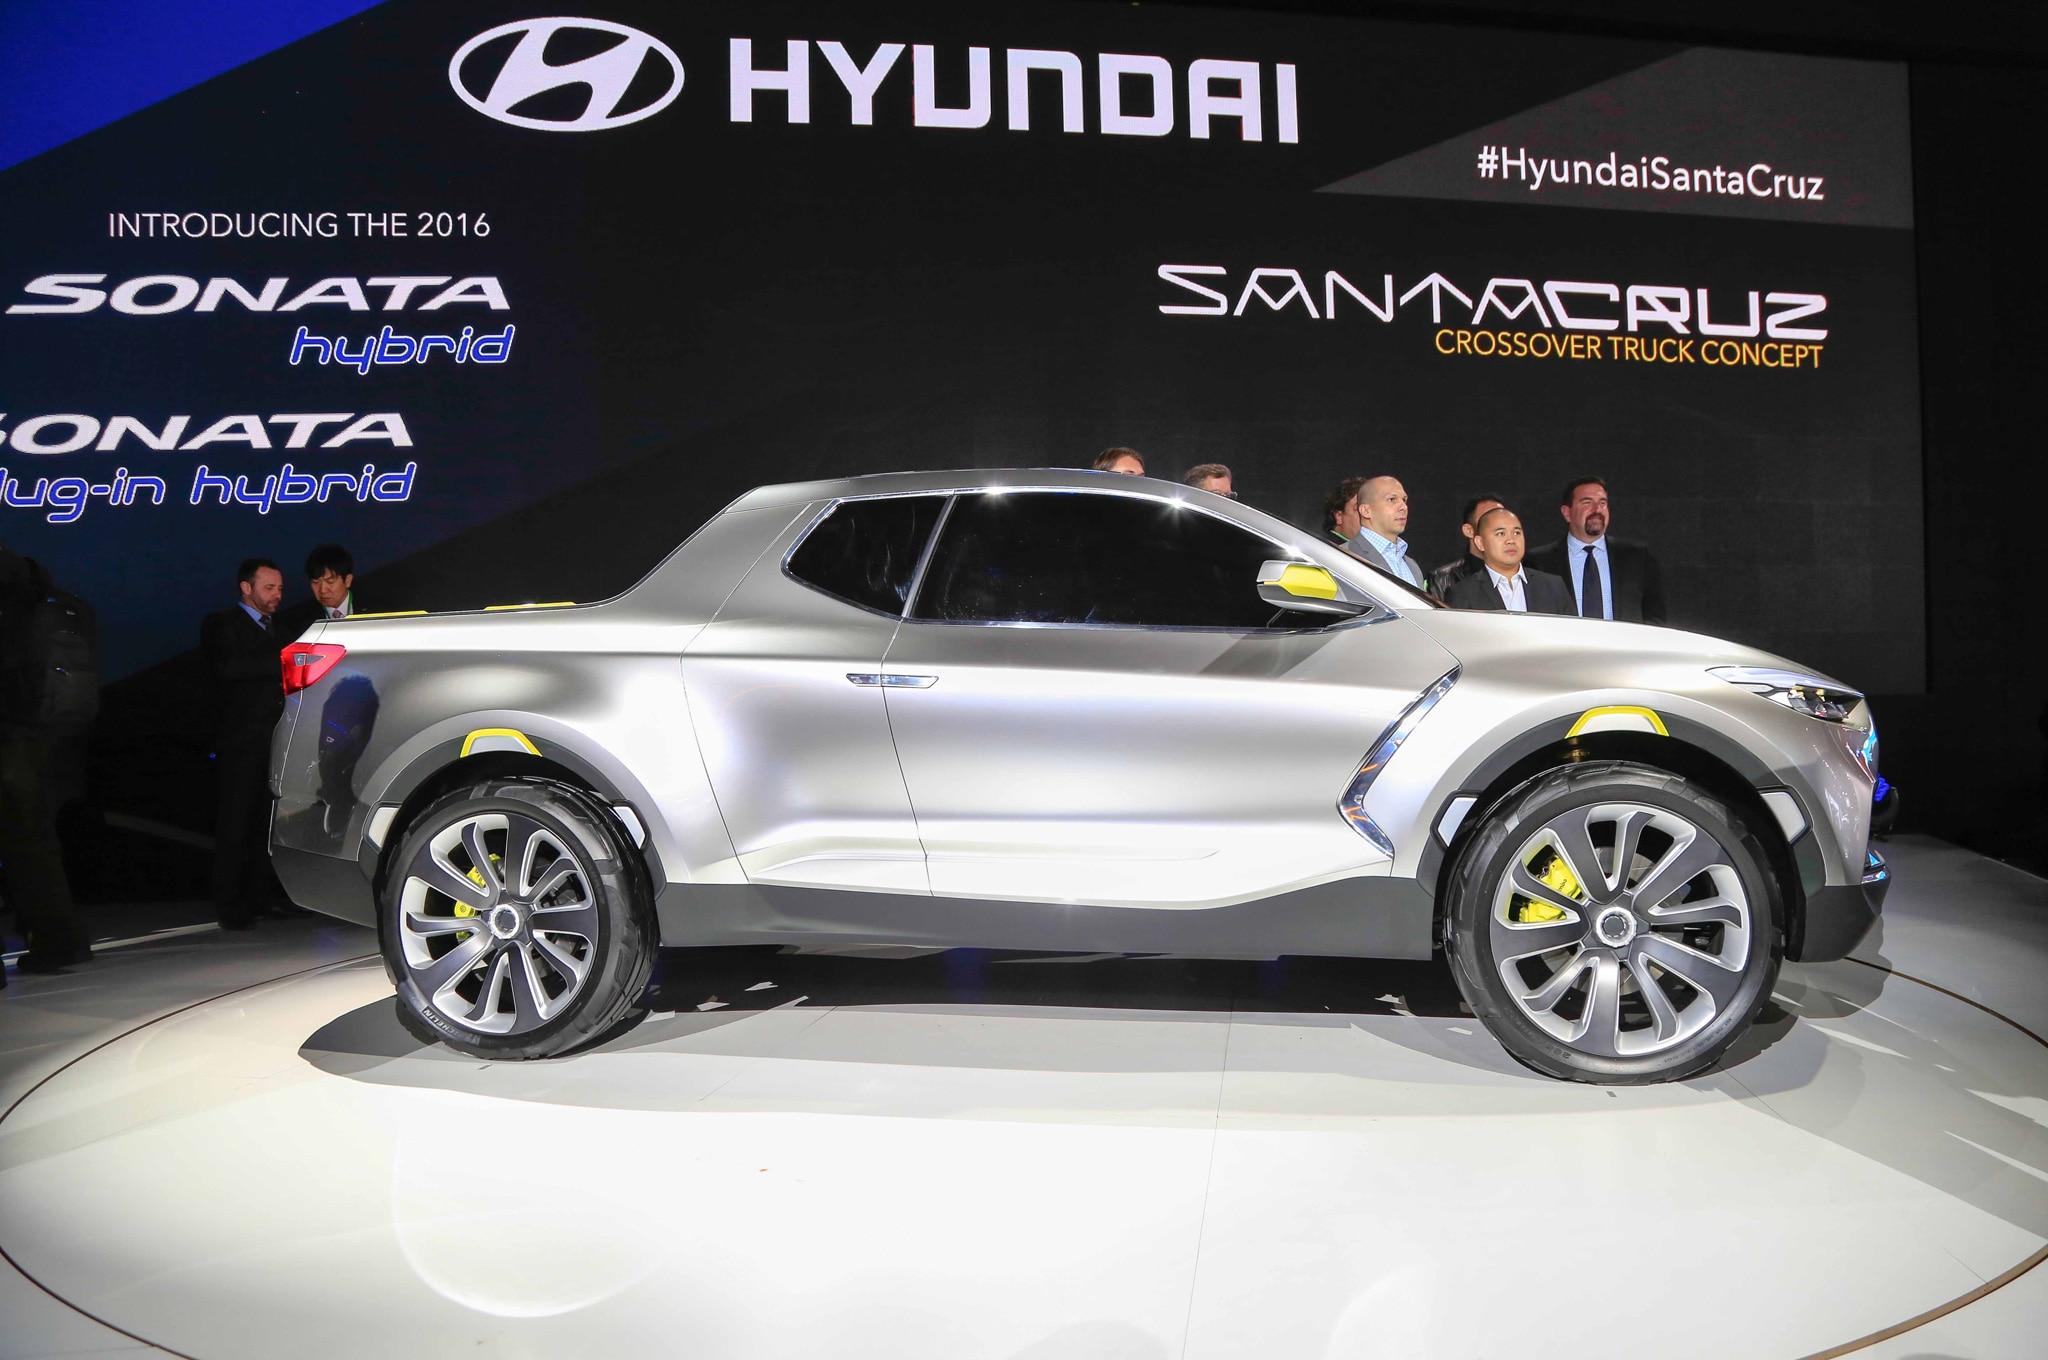 Hyundai Santa Cruz Crossover Truck Concept Side Profile